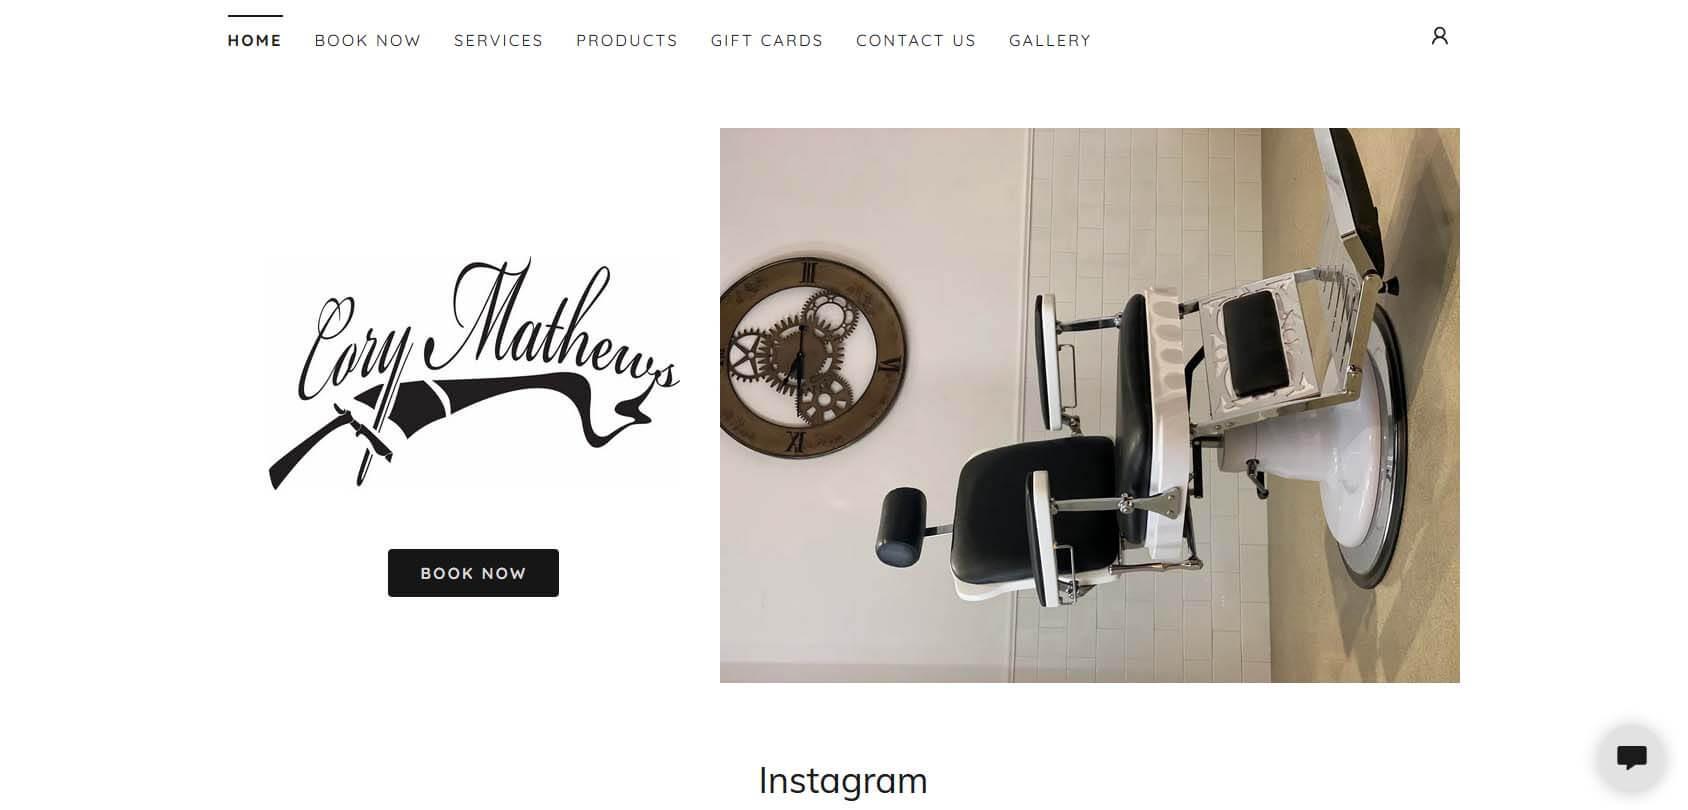 Cory Mathews Men's Grooming Homepage